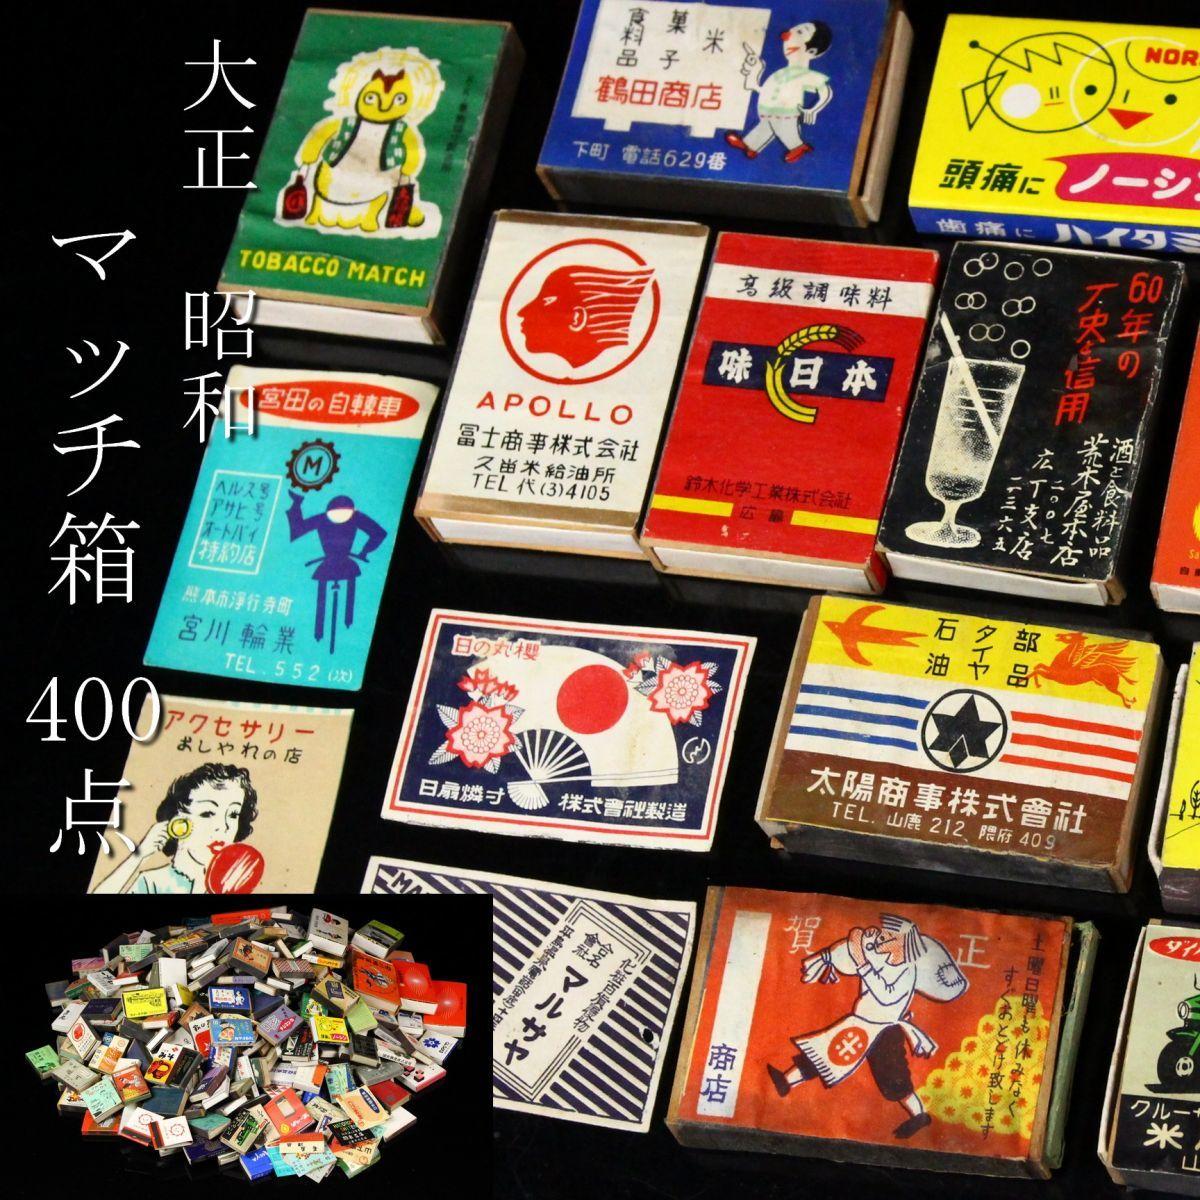 【LIG】大正 昭和 マッチ箱 マッチラベル 大量 約400枚 コレクター放出品 ② [ee]05櫻